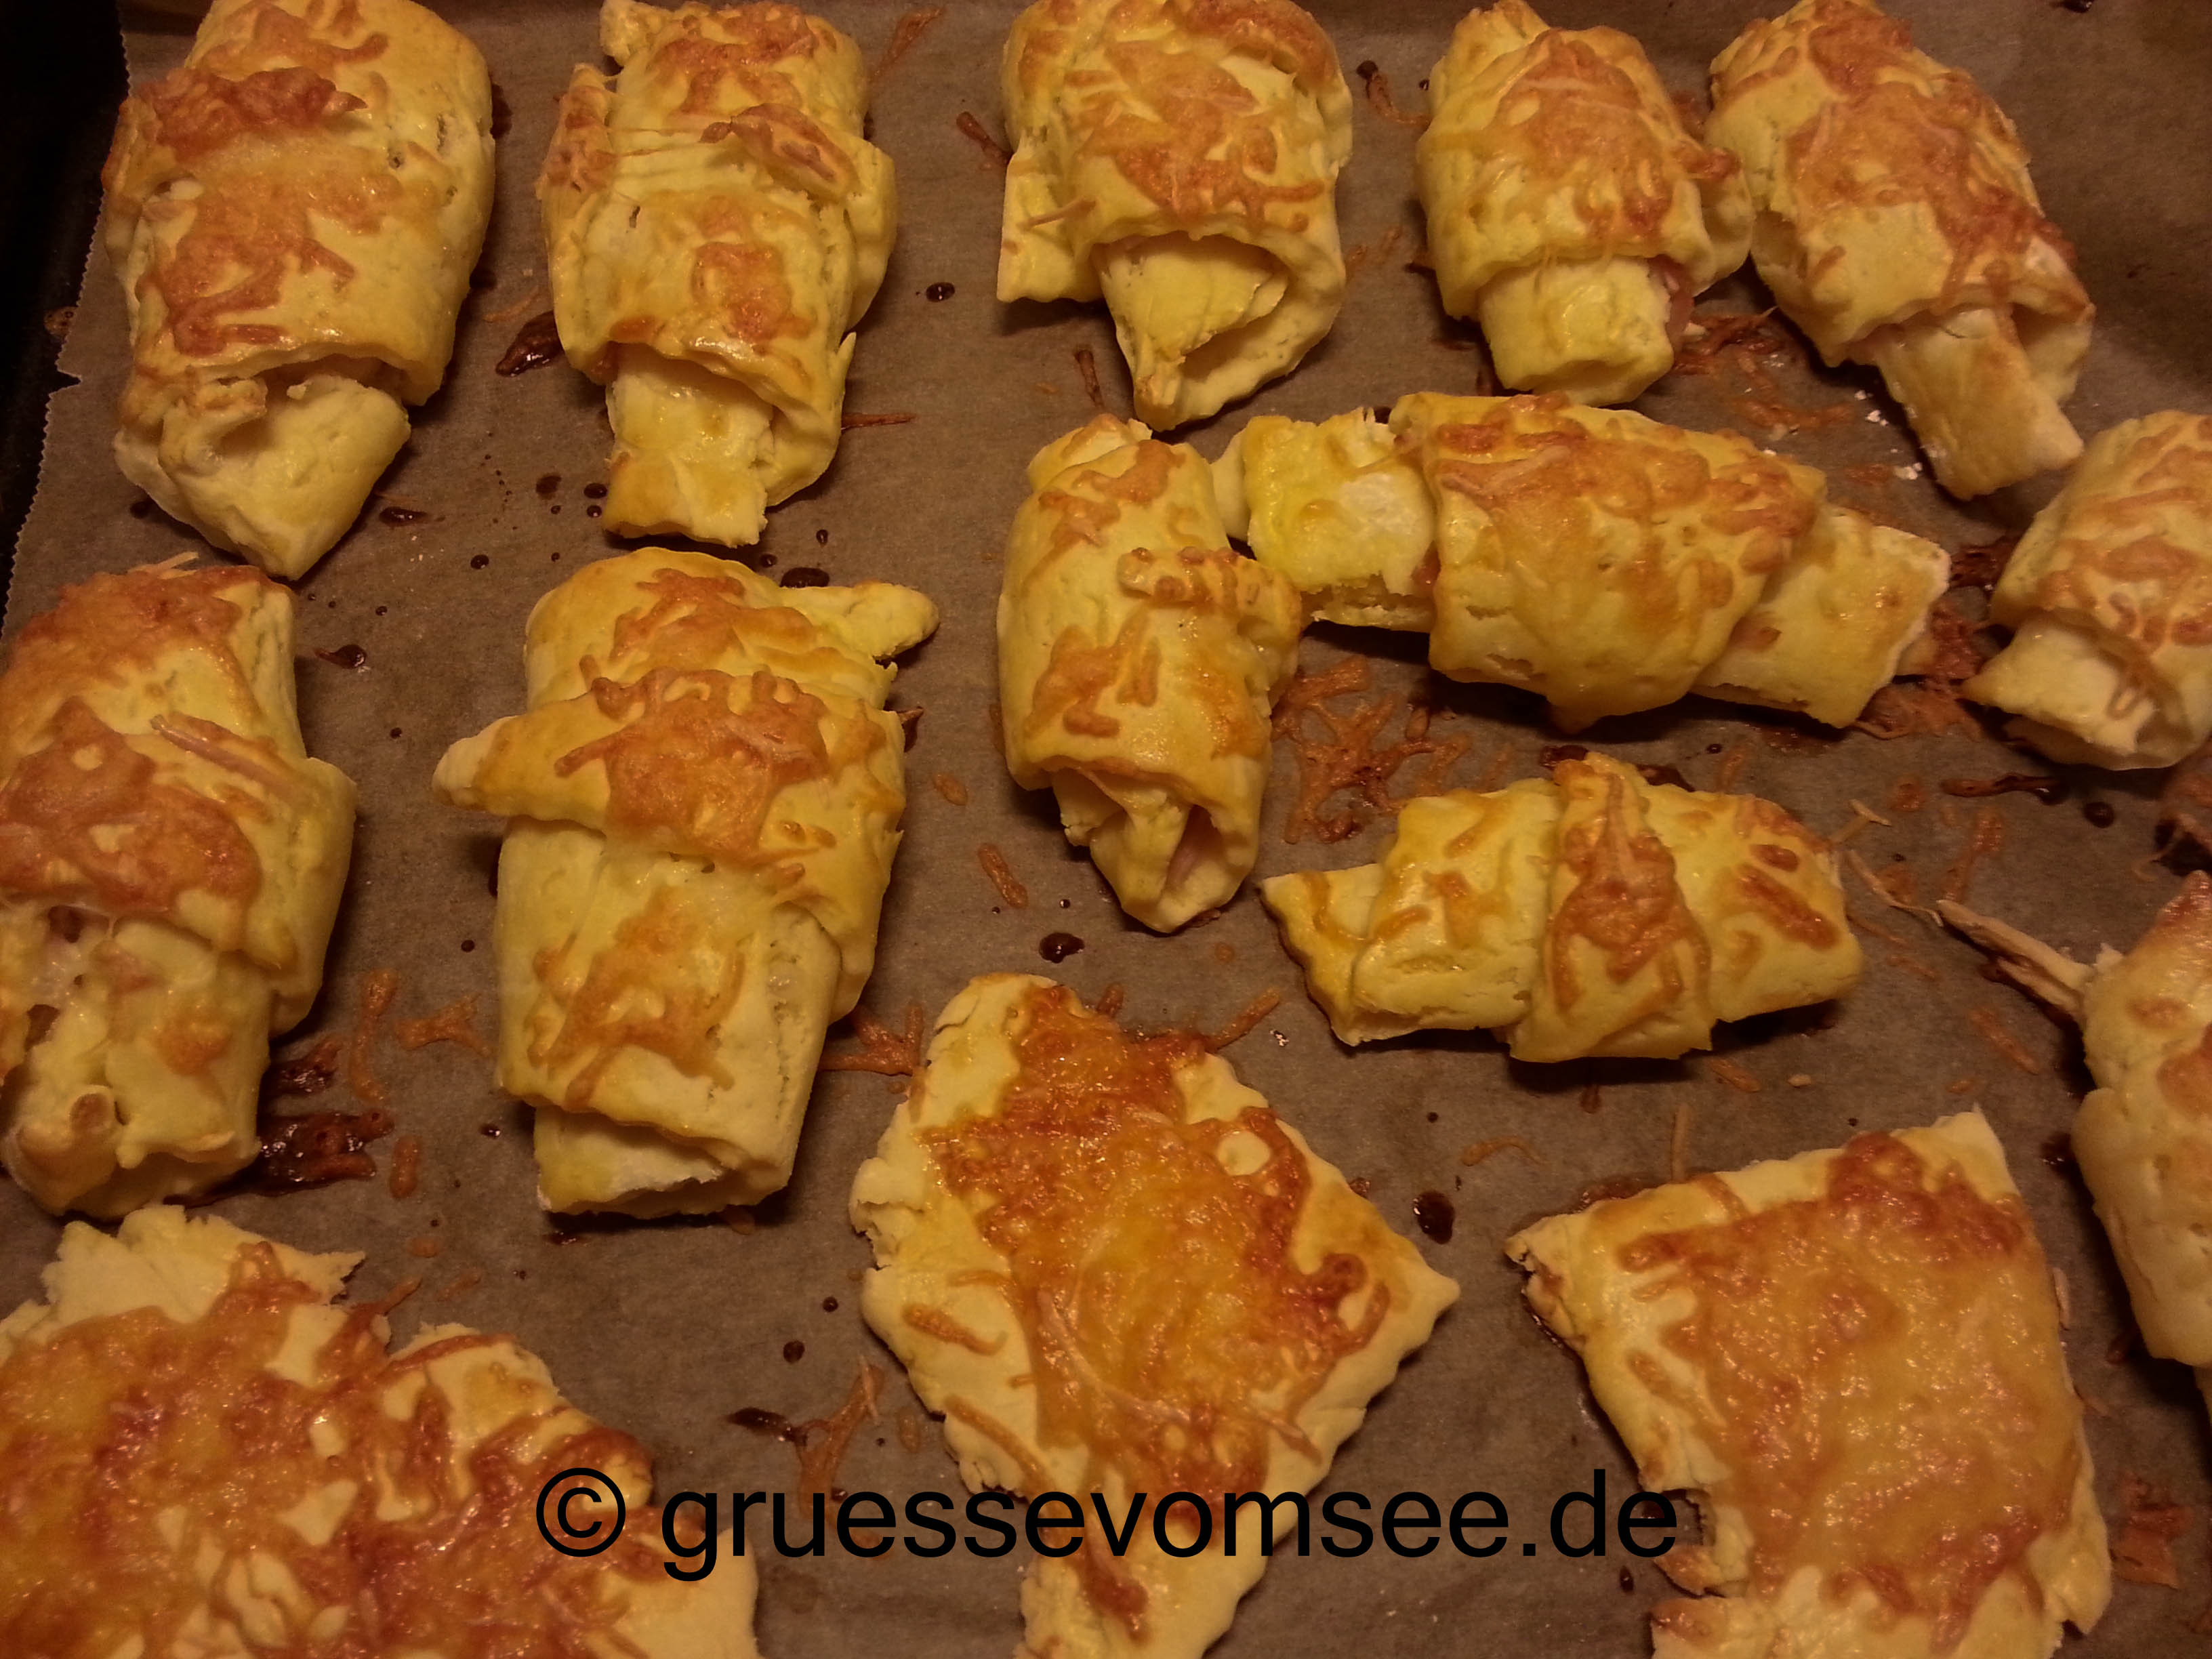 Schinken_Kaese_croissants_glutenfrei_Gruessevomsee